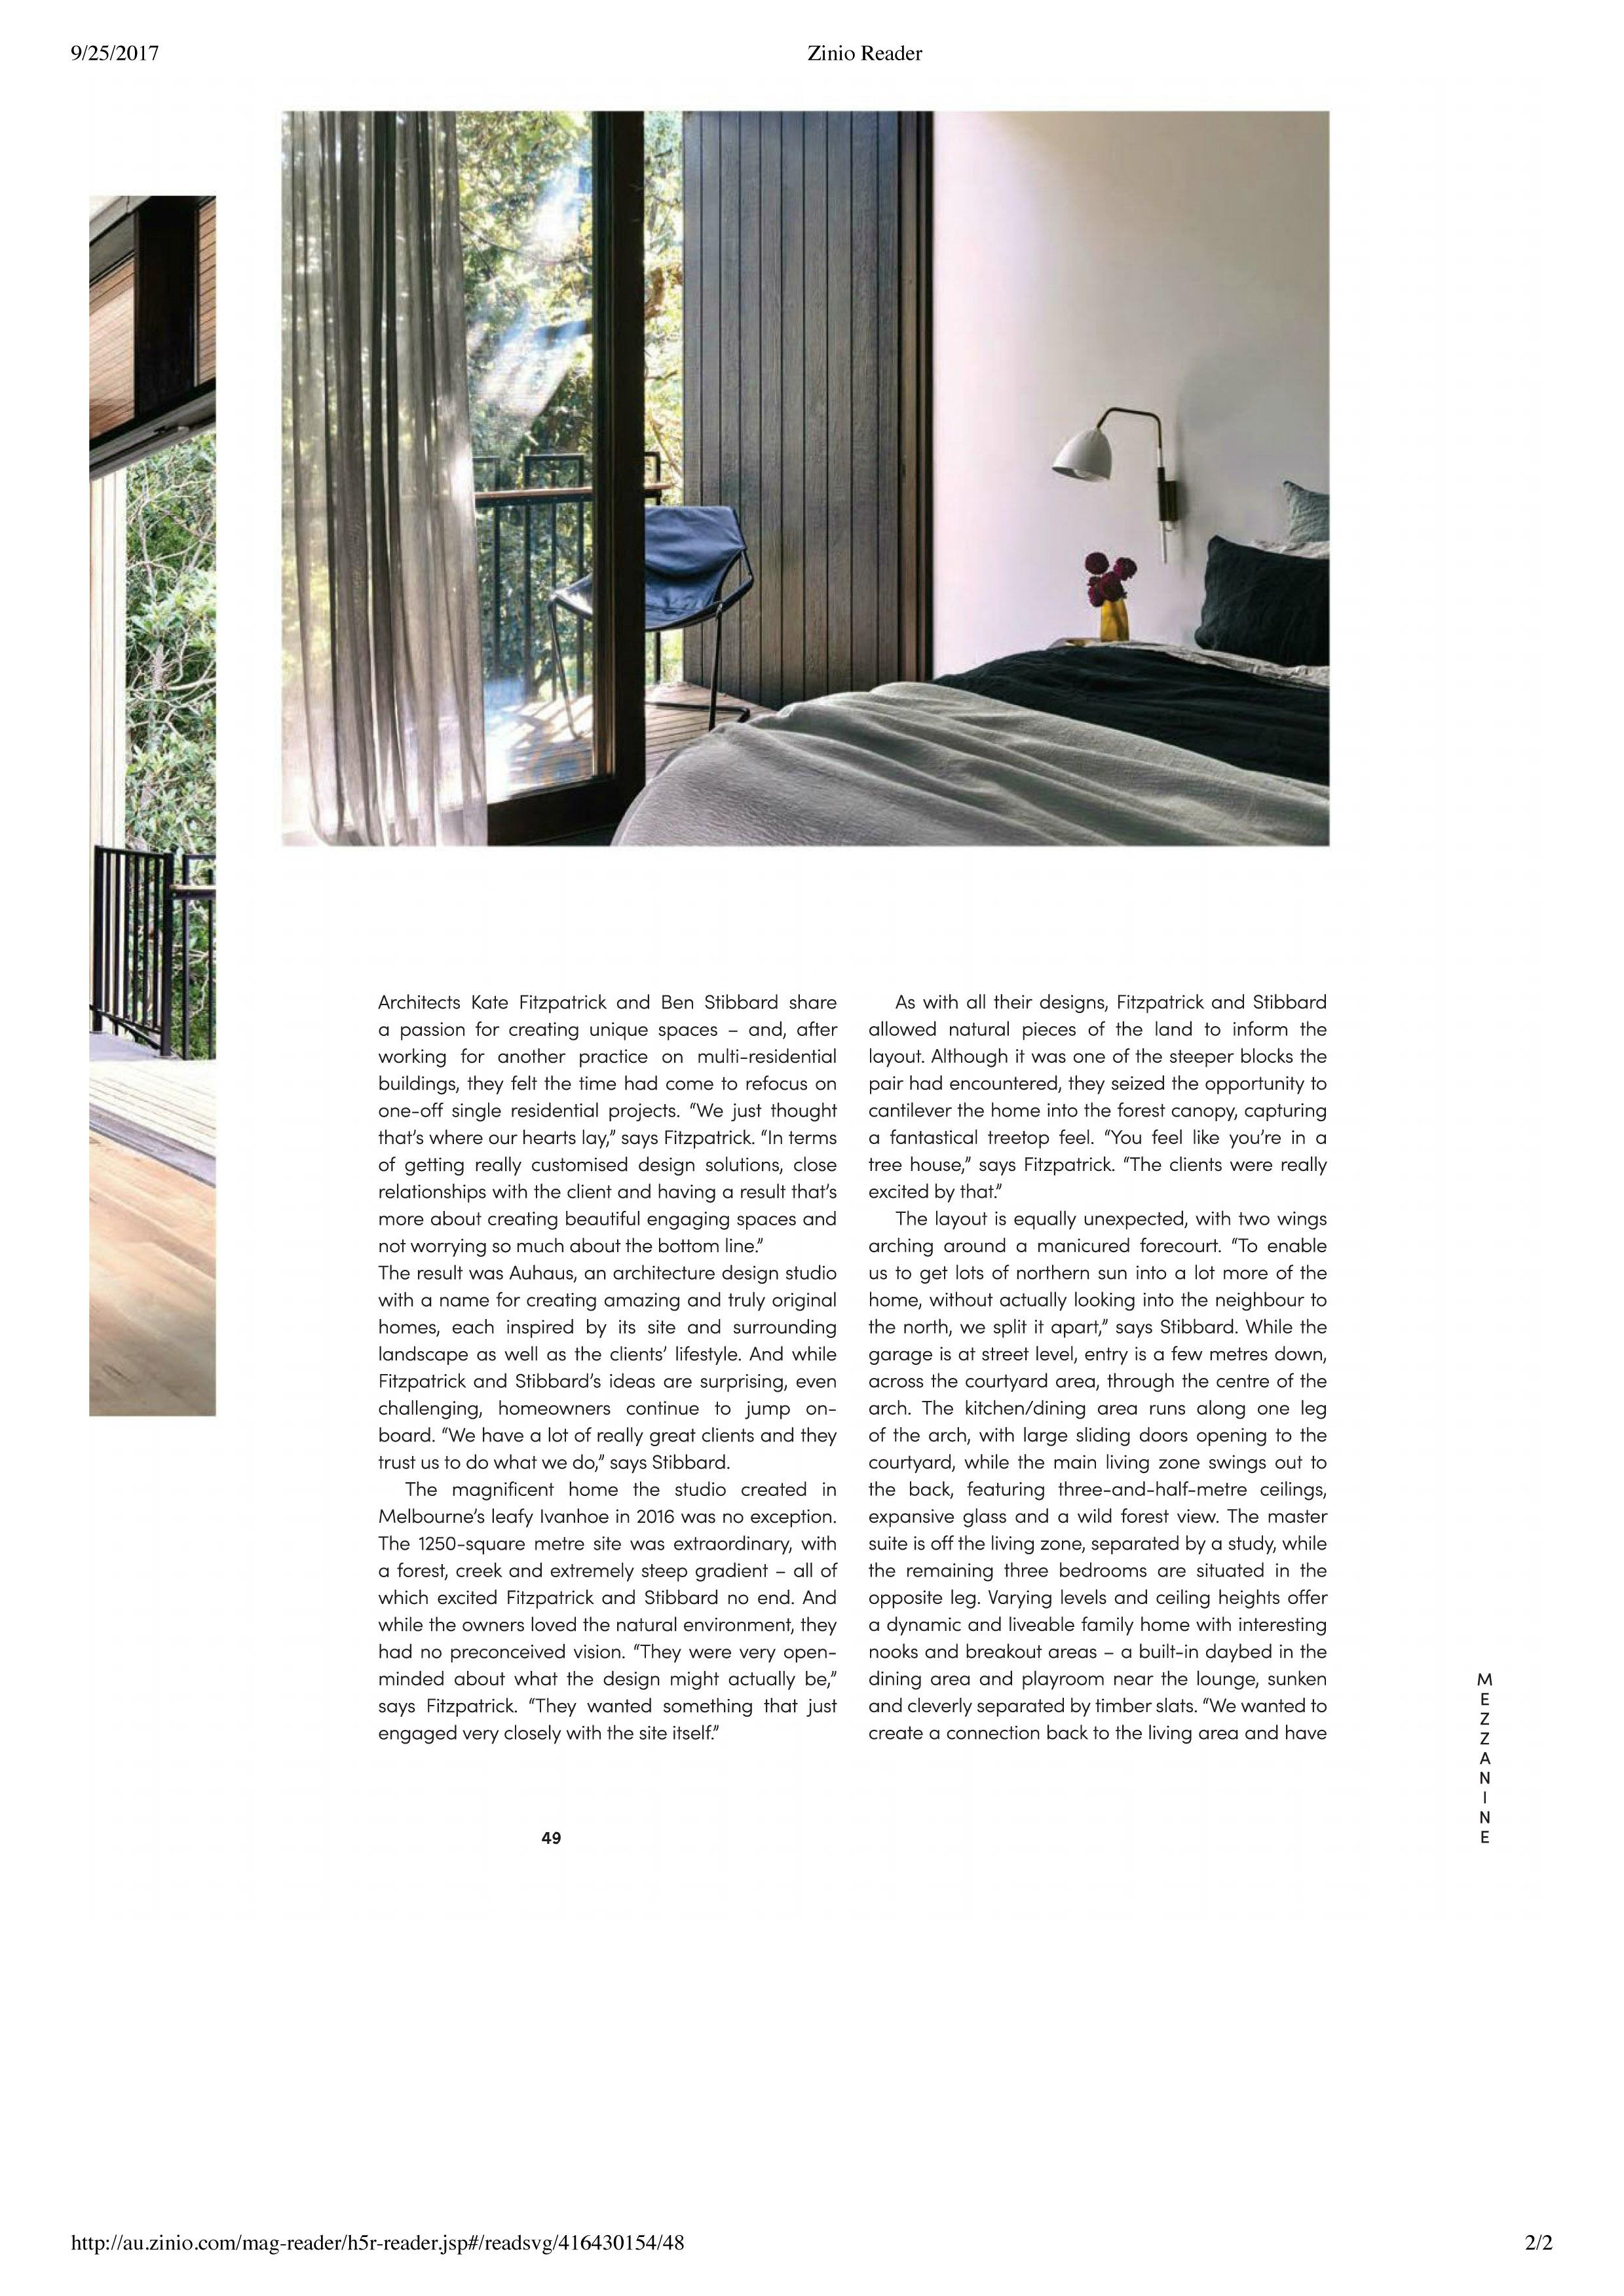 Zinio Reader pg4.jpg